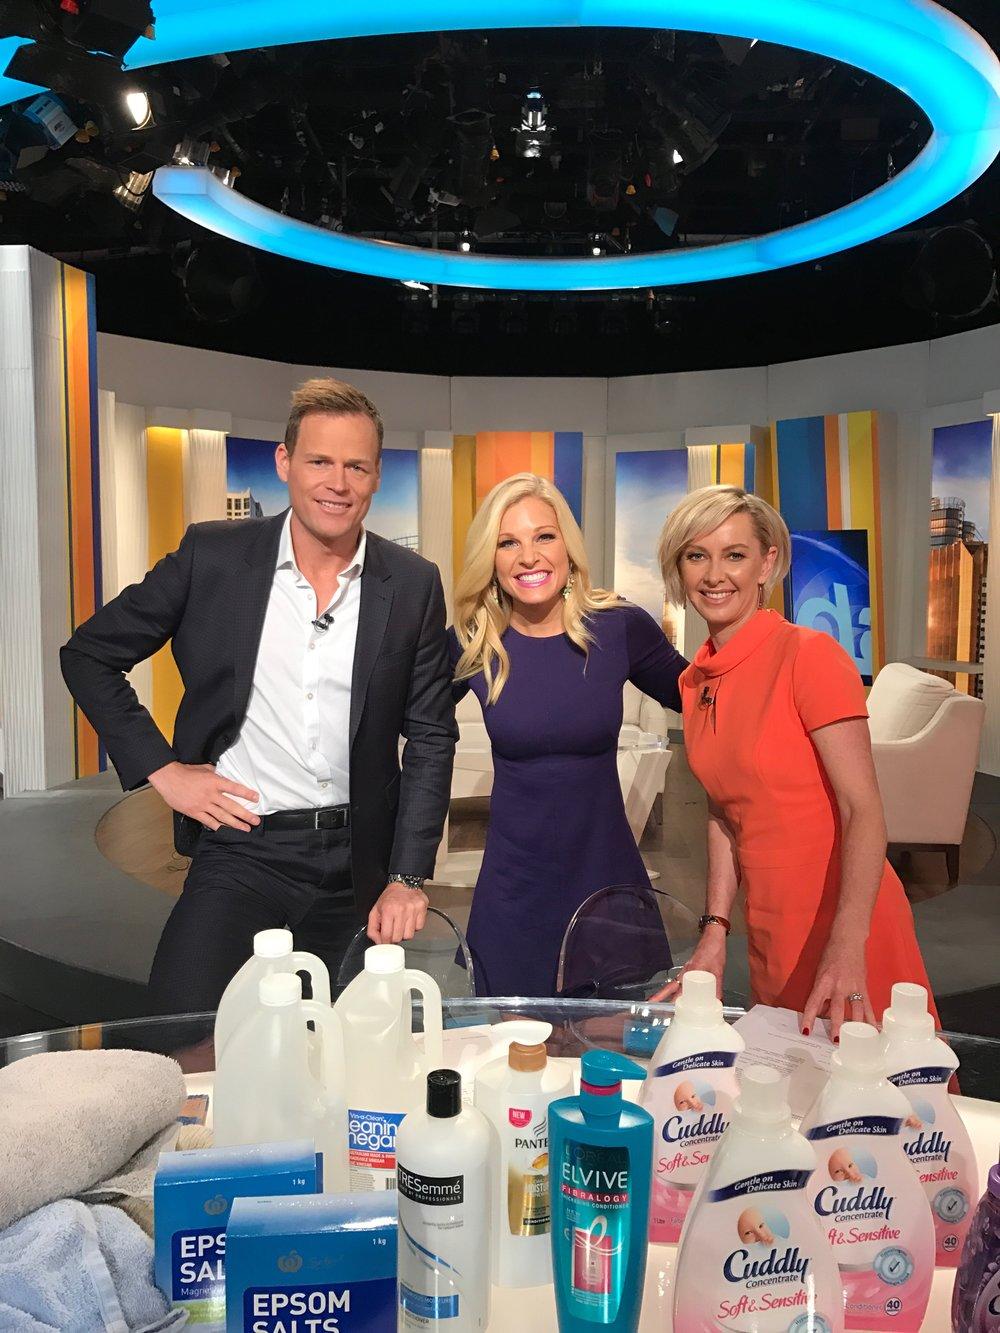 Anna Kooiman The Today Show Australia Deb and Tom 2017 AnnaKooiman.com fitness travel lifestyle